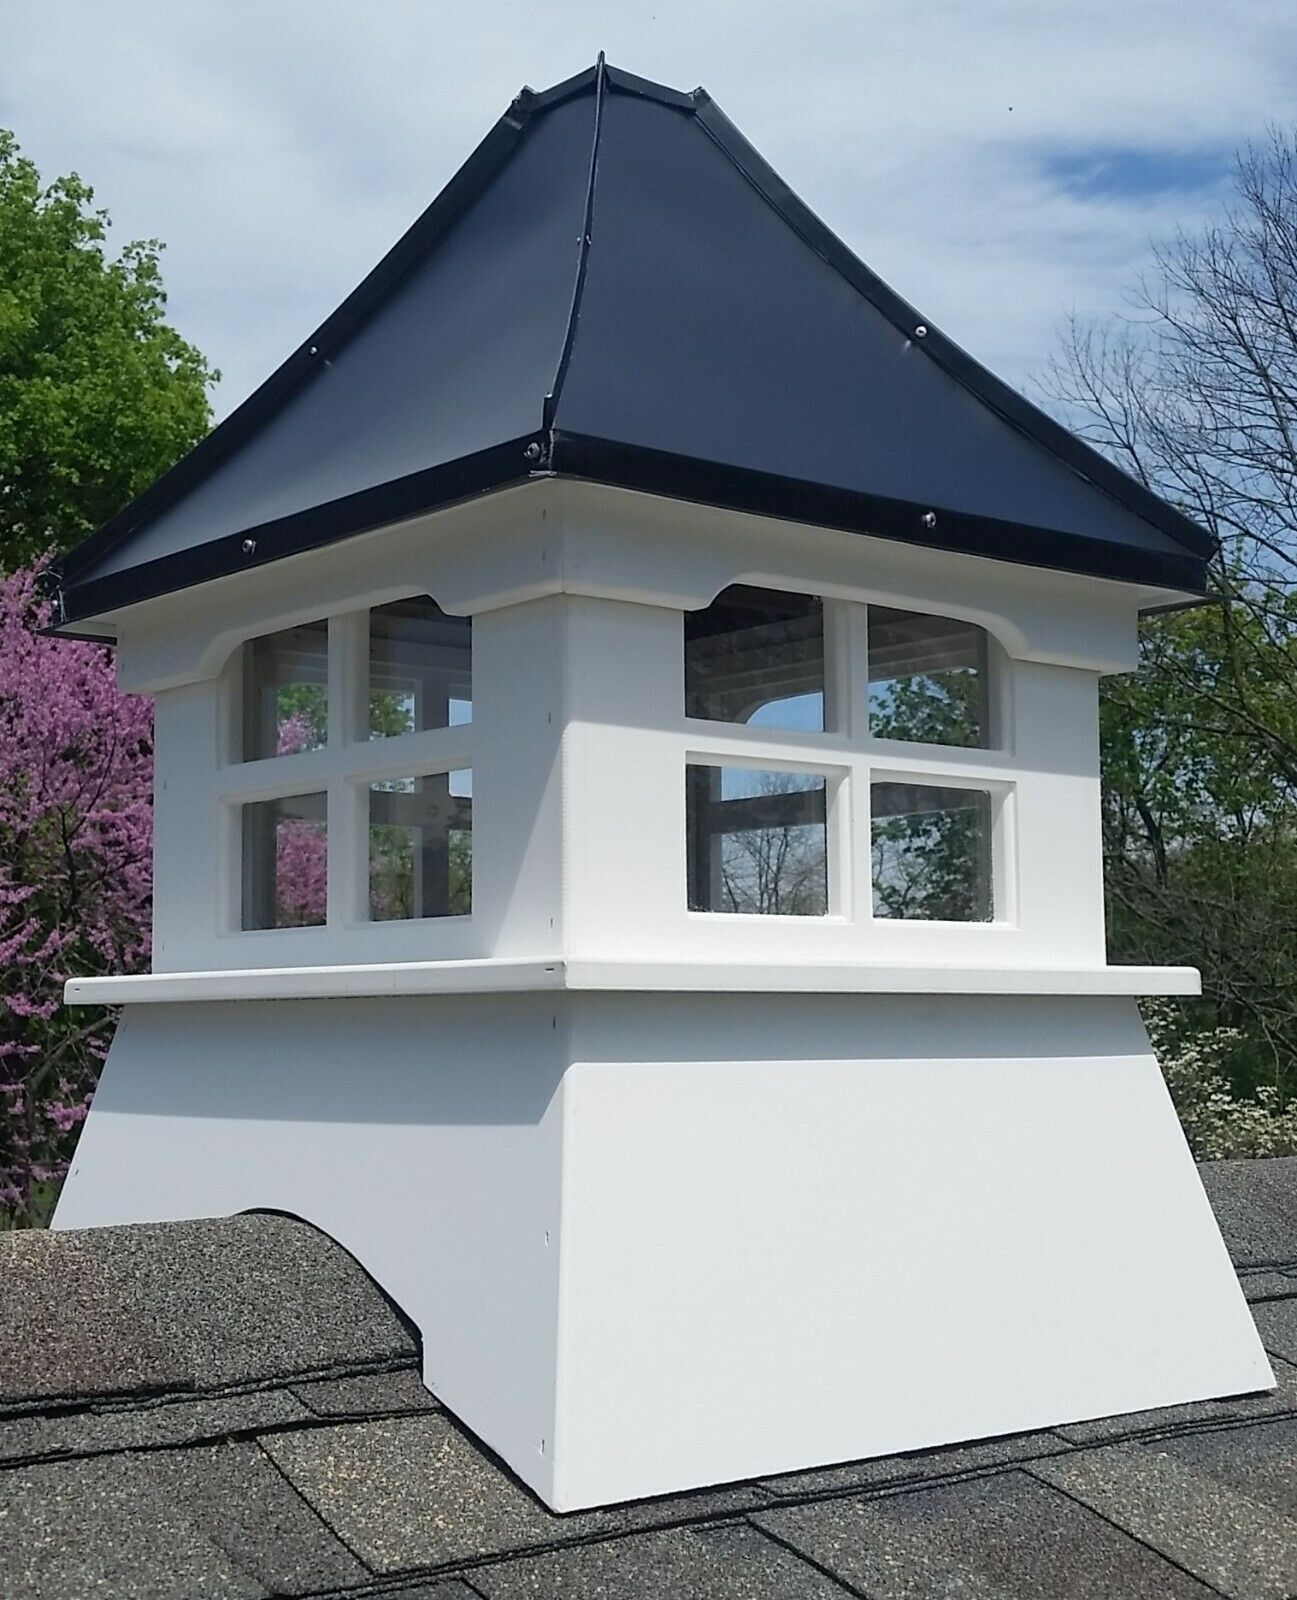 Accentua Laguna Vinyl Cupola with Copper Roof, 20 in. Square, 32 in. High